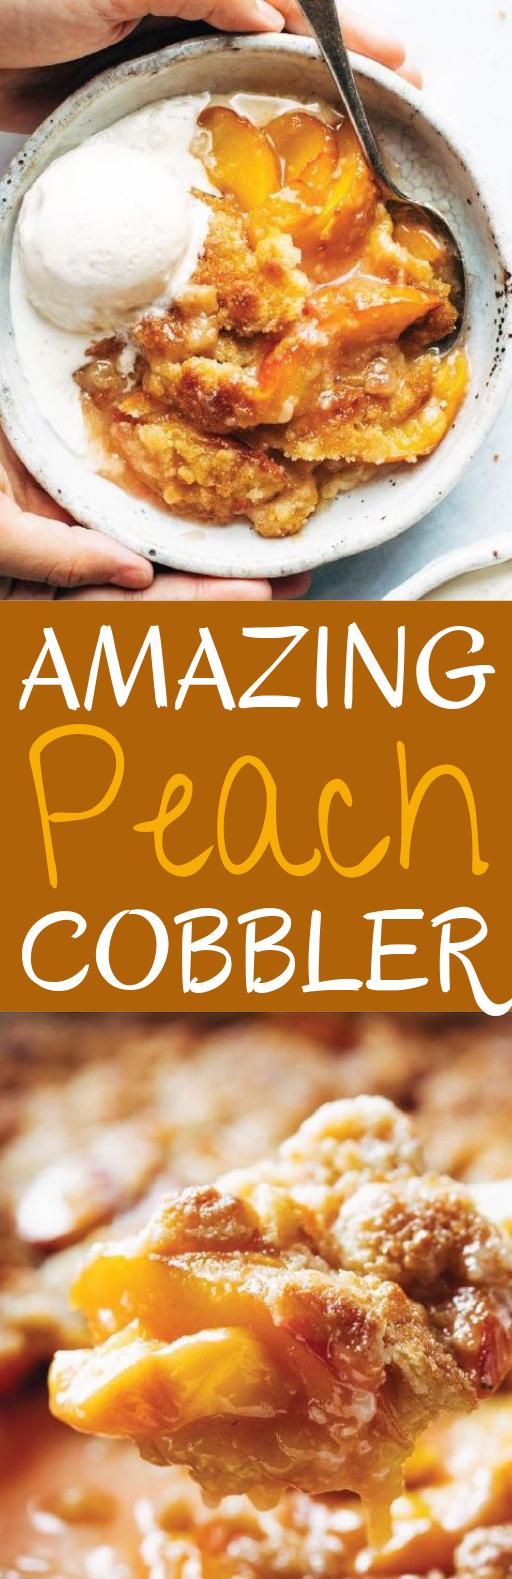 Amazing Peach Cobbler #summer #desserts